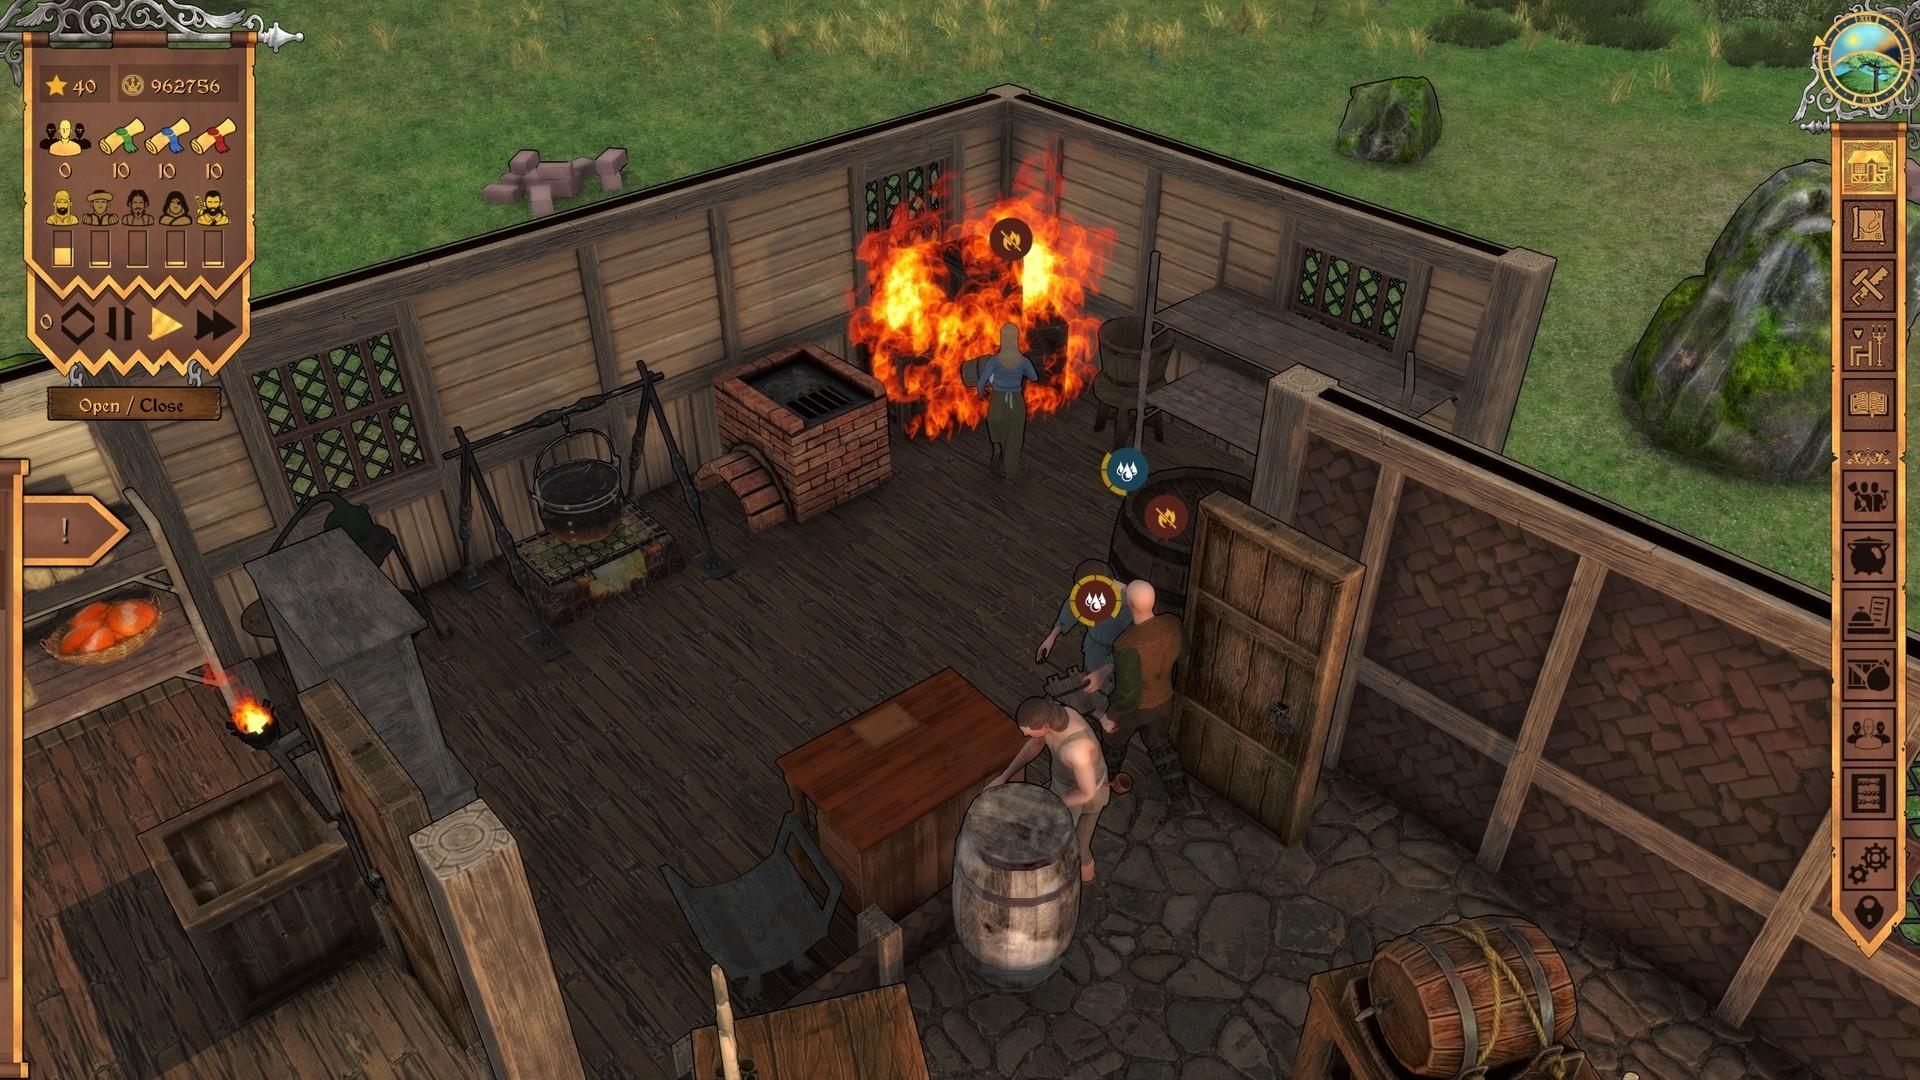 crossroads-inn-anniversary-edition-pc-screenshot-04